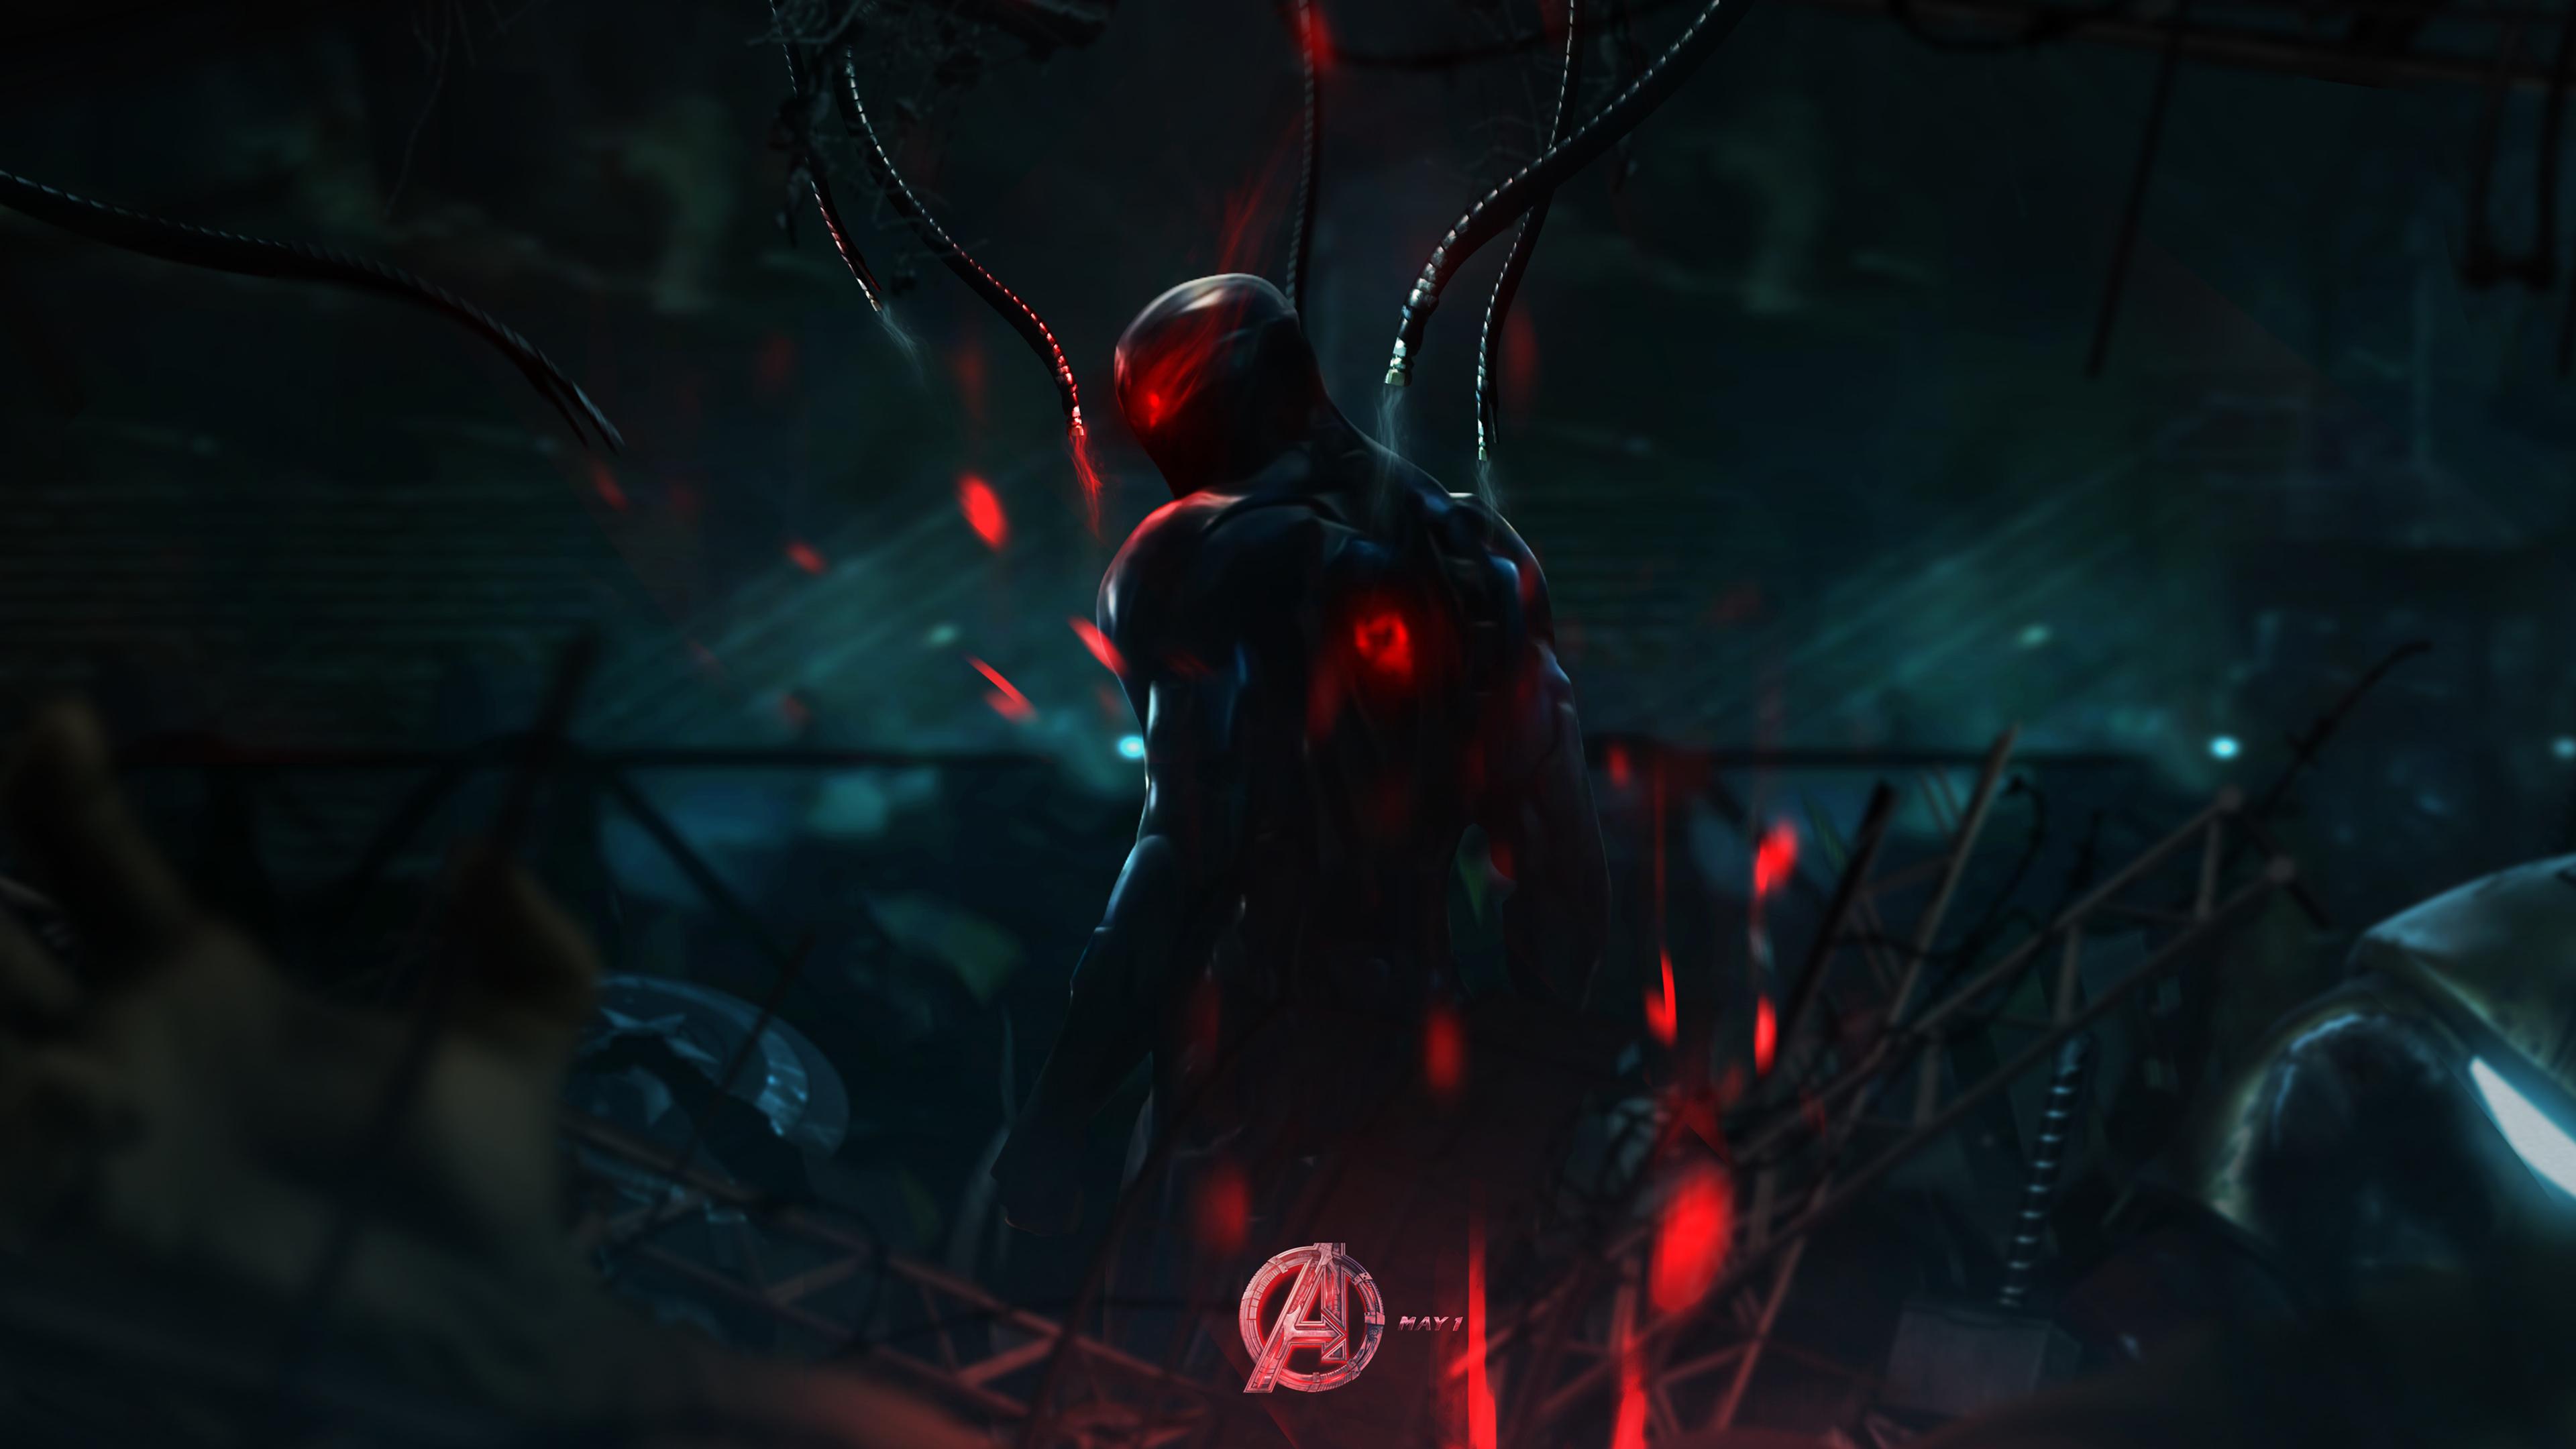 ultron avengers age of ultron 4k 1554245020 - Ultron Avengers Age Of Ultron 4k - ultron wallpapers, superheroes wallpapers, hd-wallpapers, digital art wallpapers, behance wallpapers, artwork wallpapers, artist wallpapers, art wallpapers